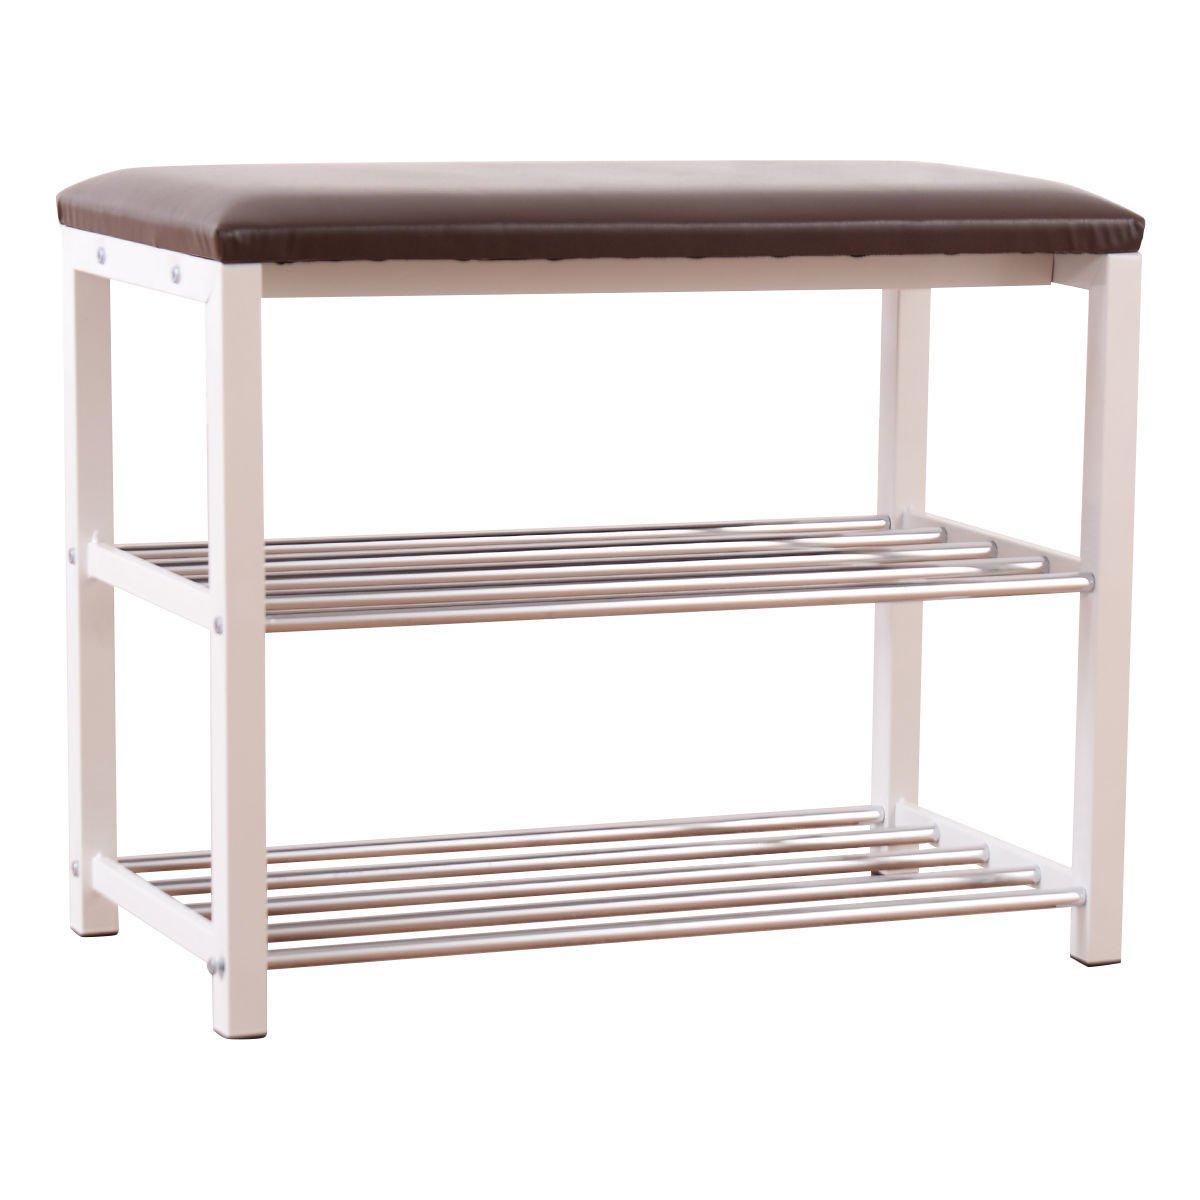 Shoe storage 3 level Storage Shoe Rack Bench Seat Organizer tier Shelf Home Dorm Entryway